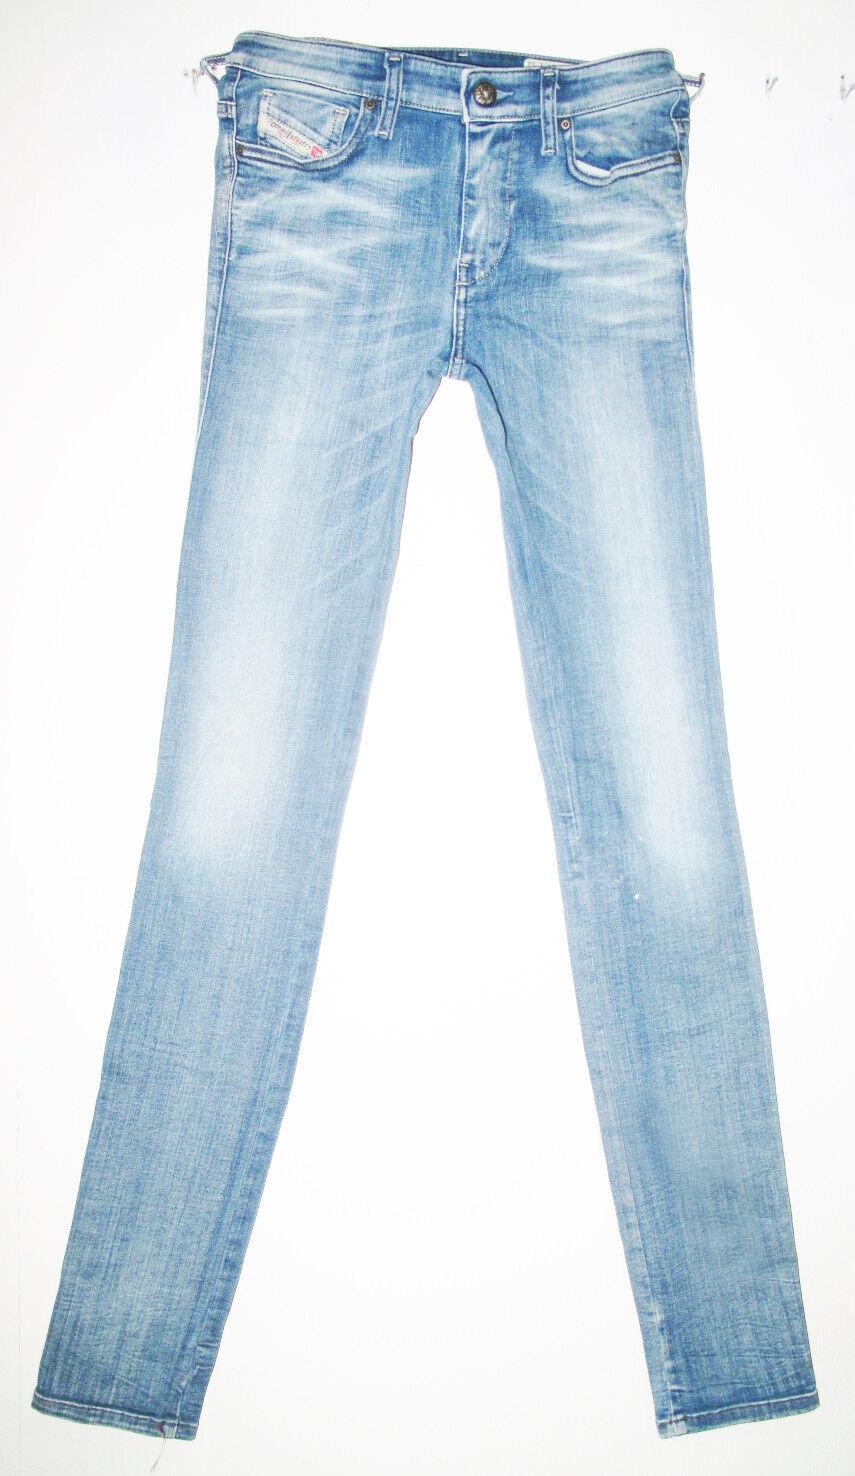 HOT Women DIESEL SKINZEE 822D Slim SKINNY STRETCH Jeans 4  27 x 34 (Fit 25 x33)